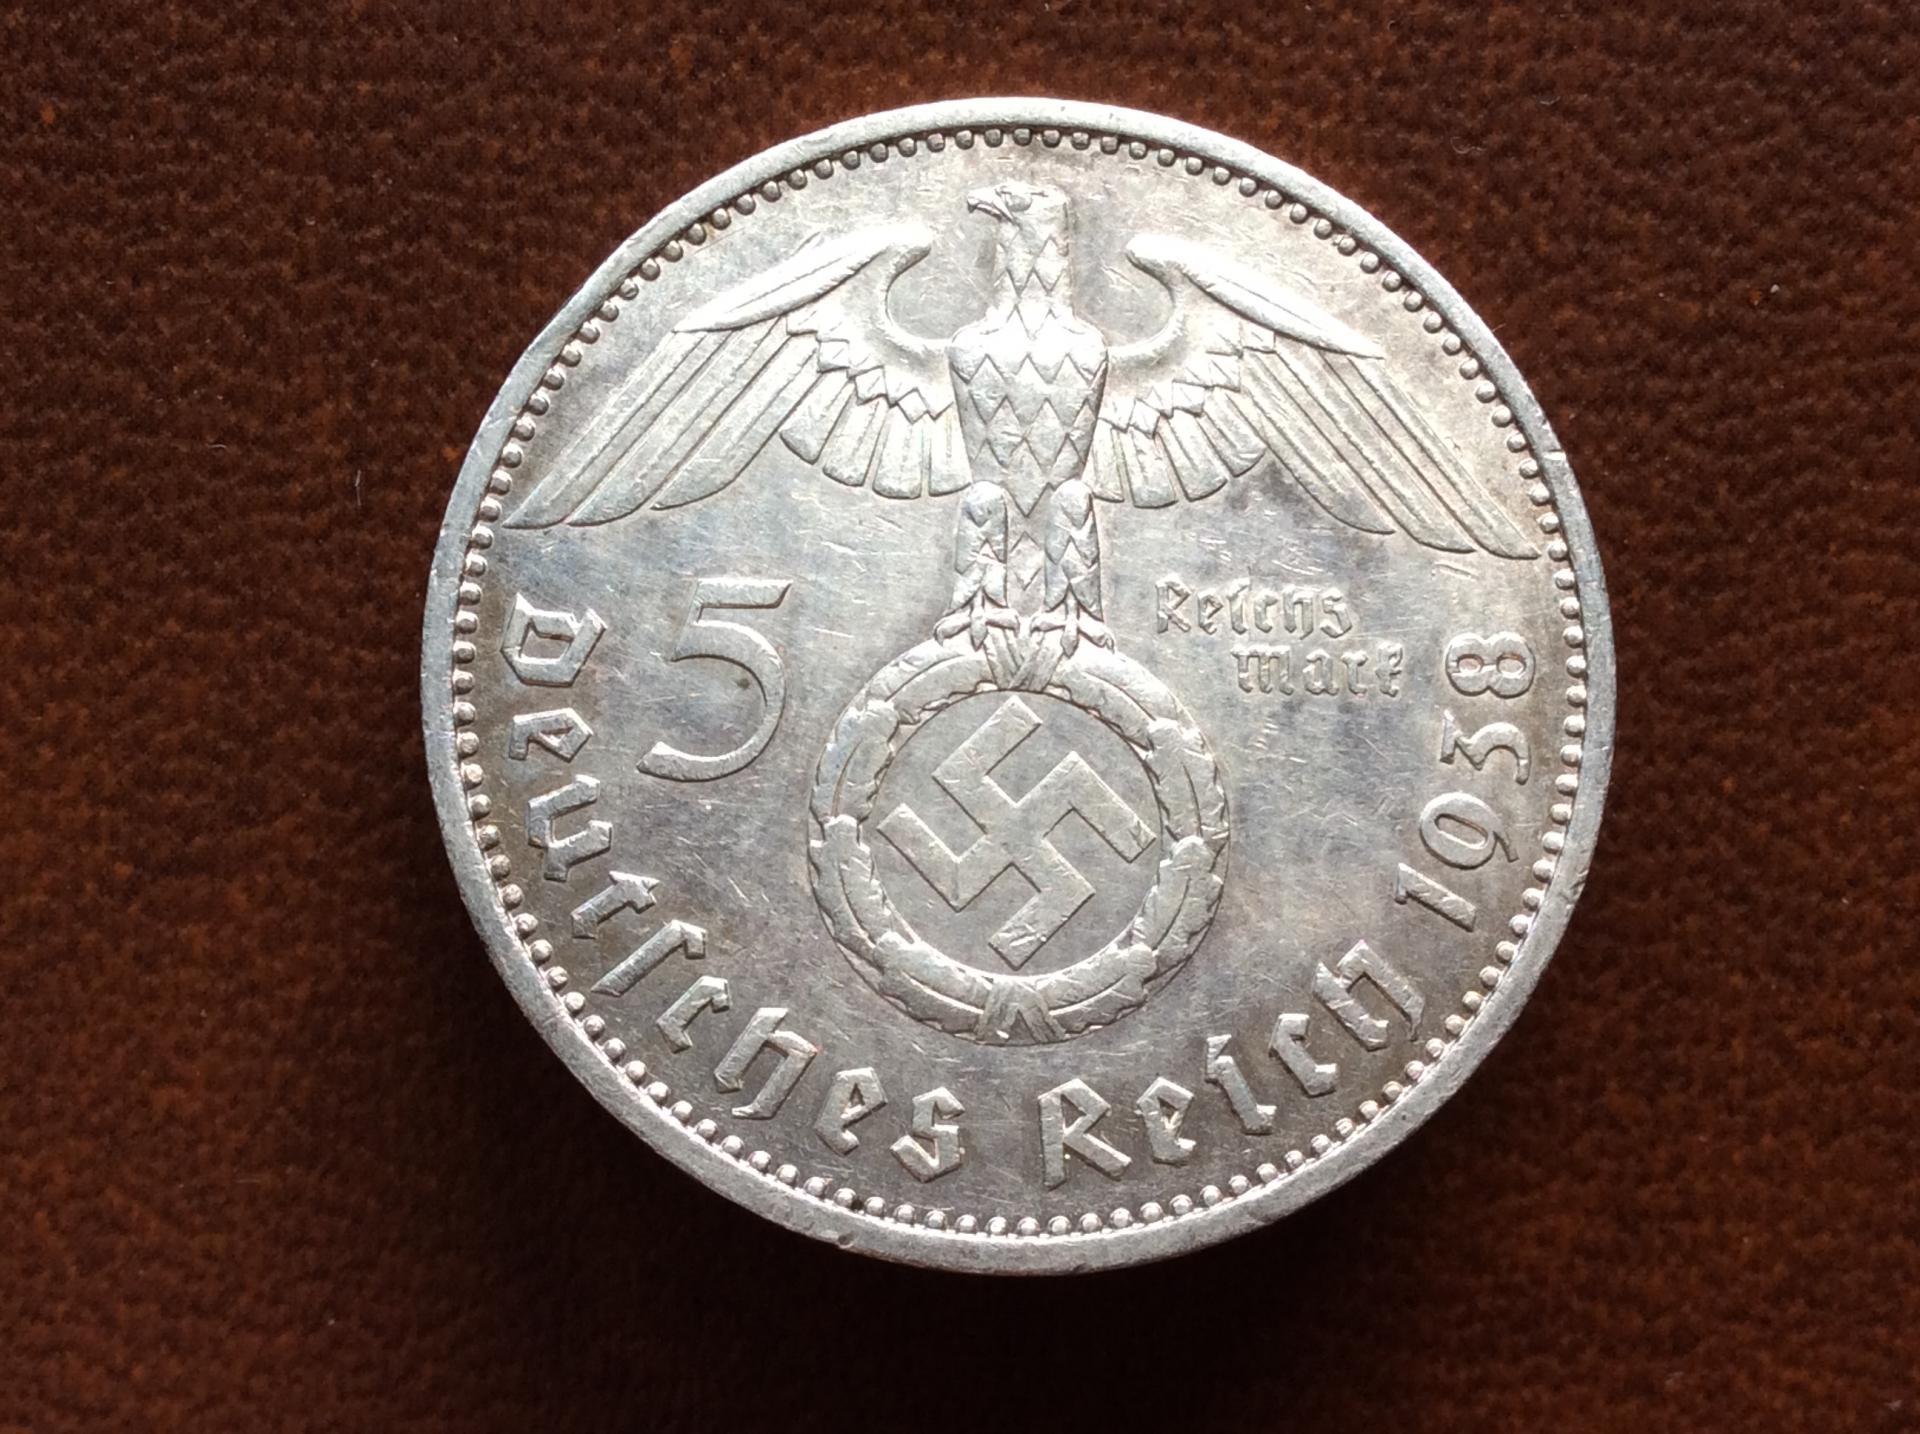 5 MARKS PLATA 1938 - ALEMANIA NAZI - 1847-1934 - ESVÁSTICA